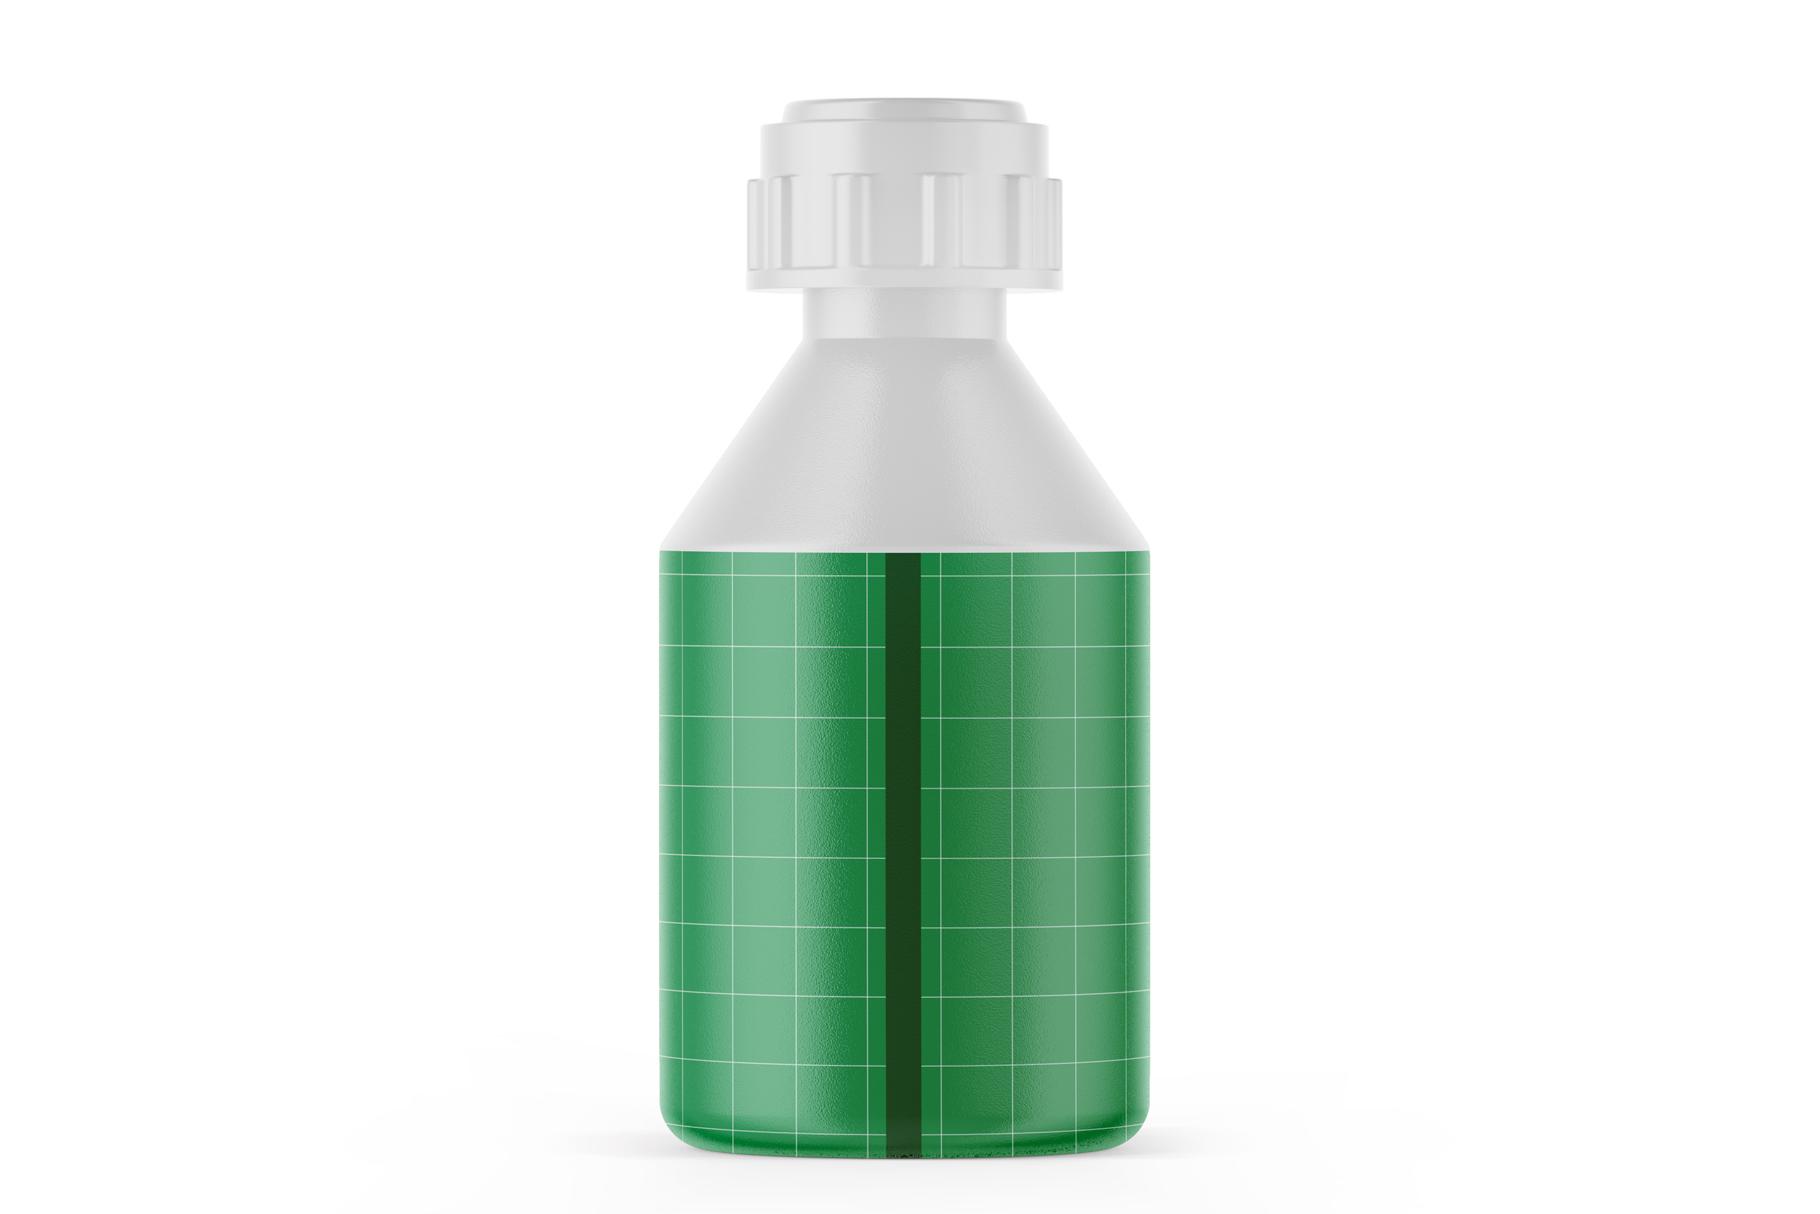 Matte Plastic Bottle Mockup example image 2